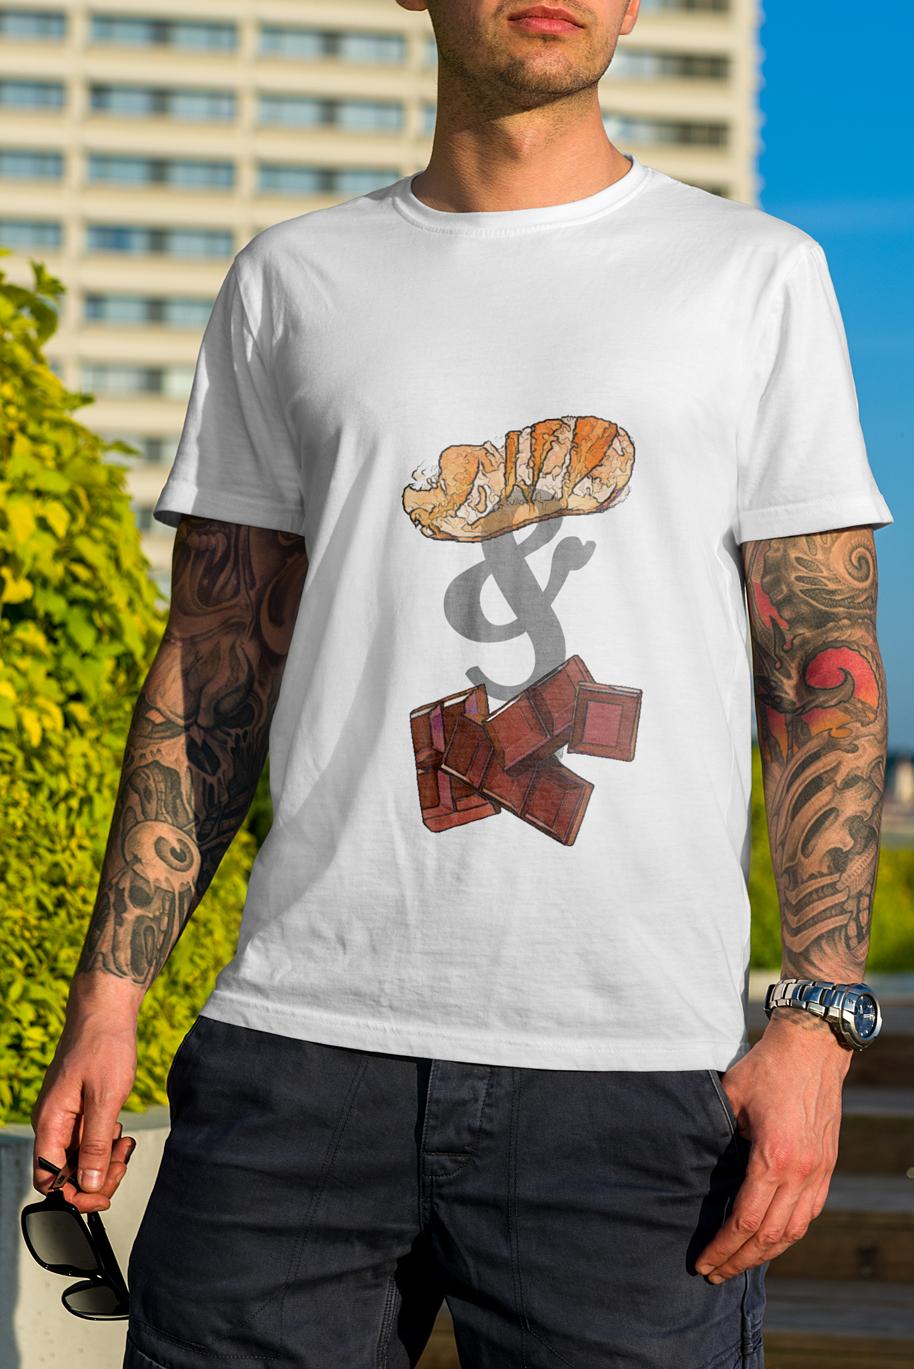 Pane_Cioccolata_man